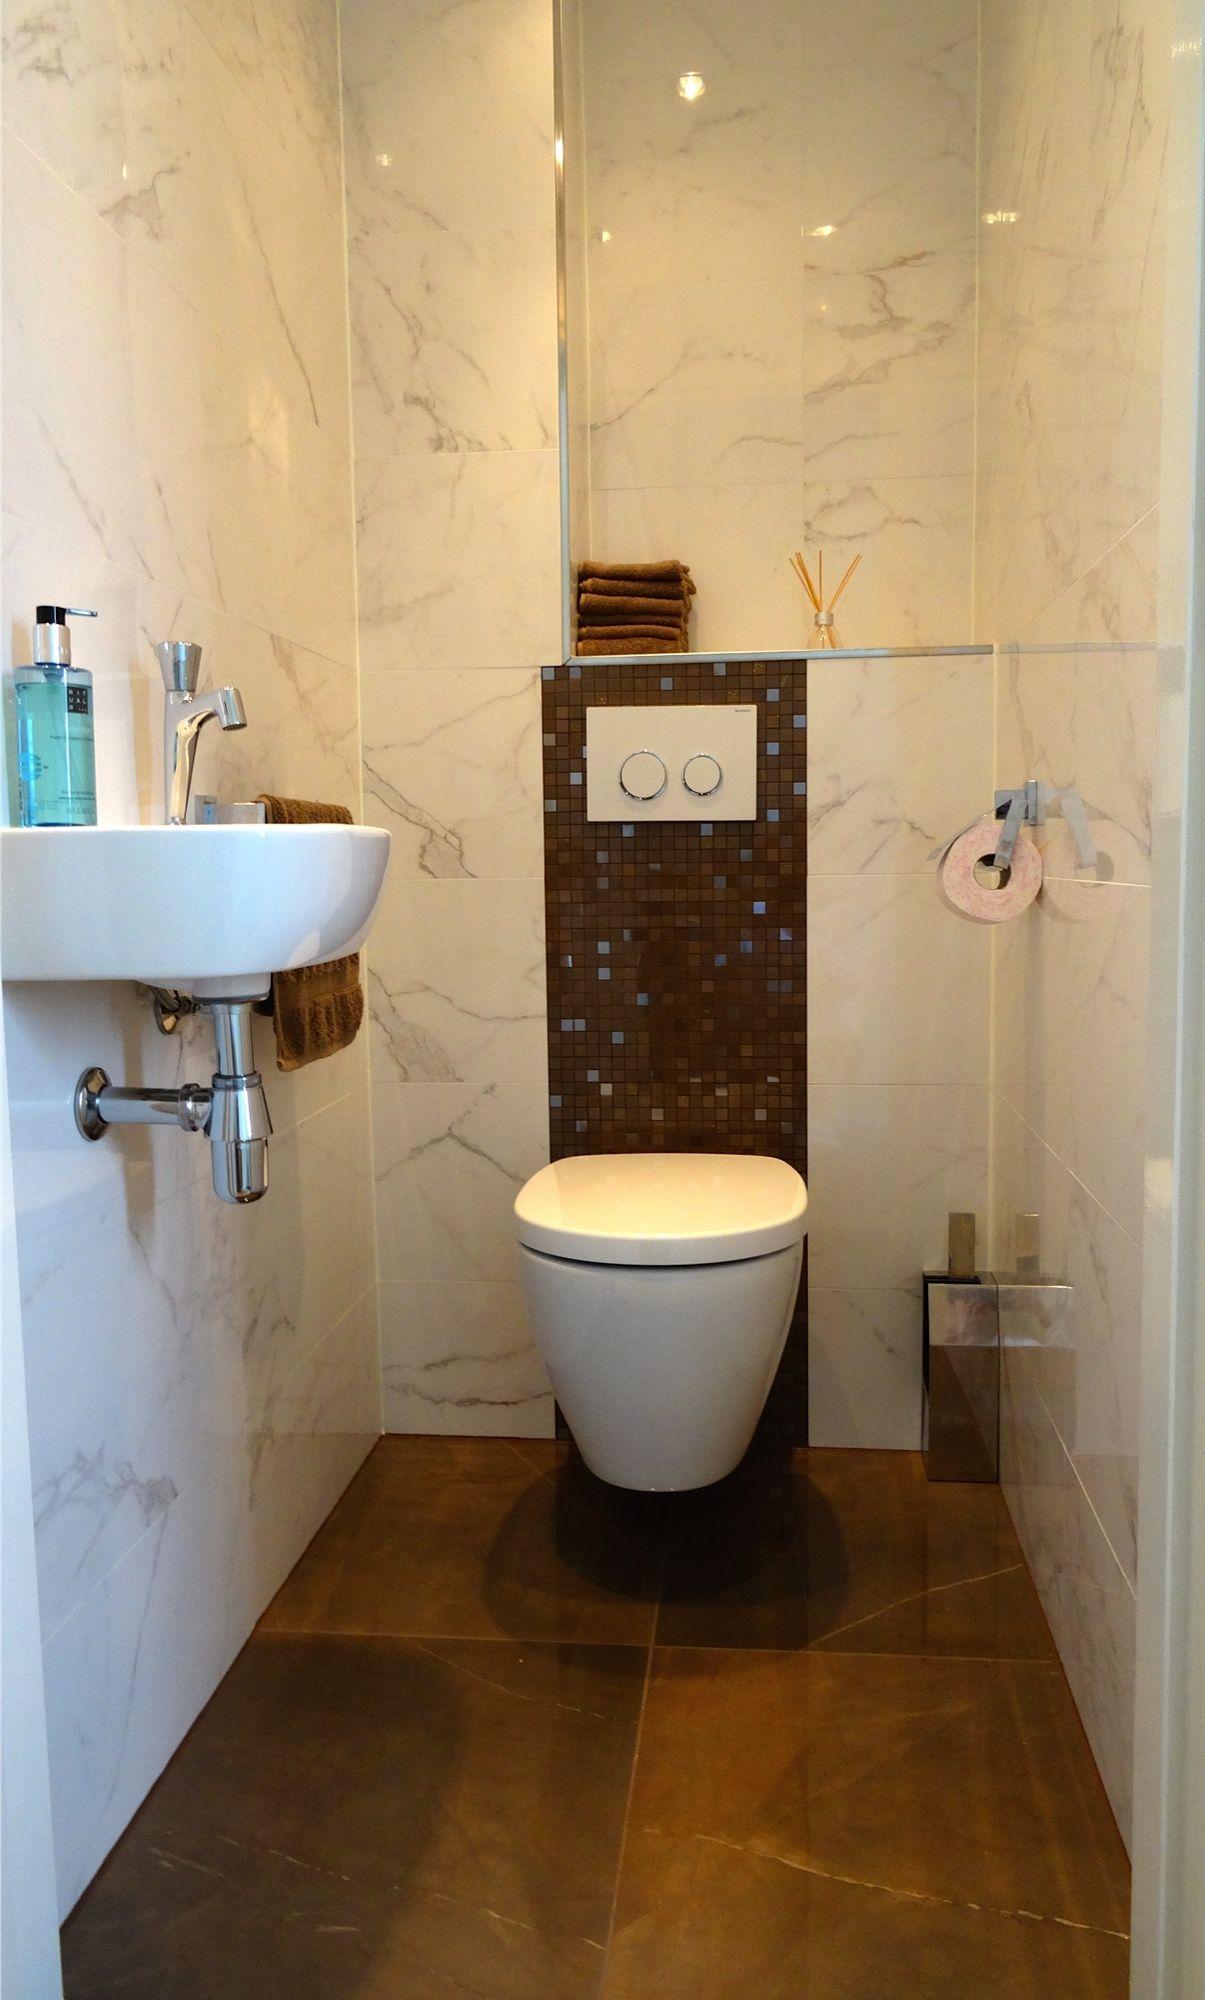 Powder Room Atlas Concorde Serie Marvel In Toilet Geplaatst